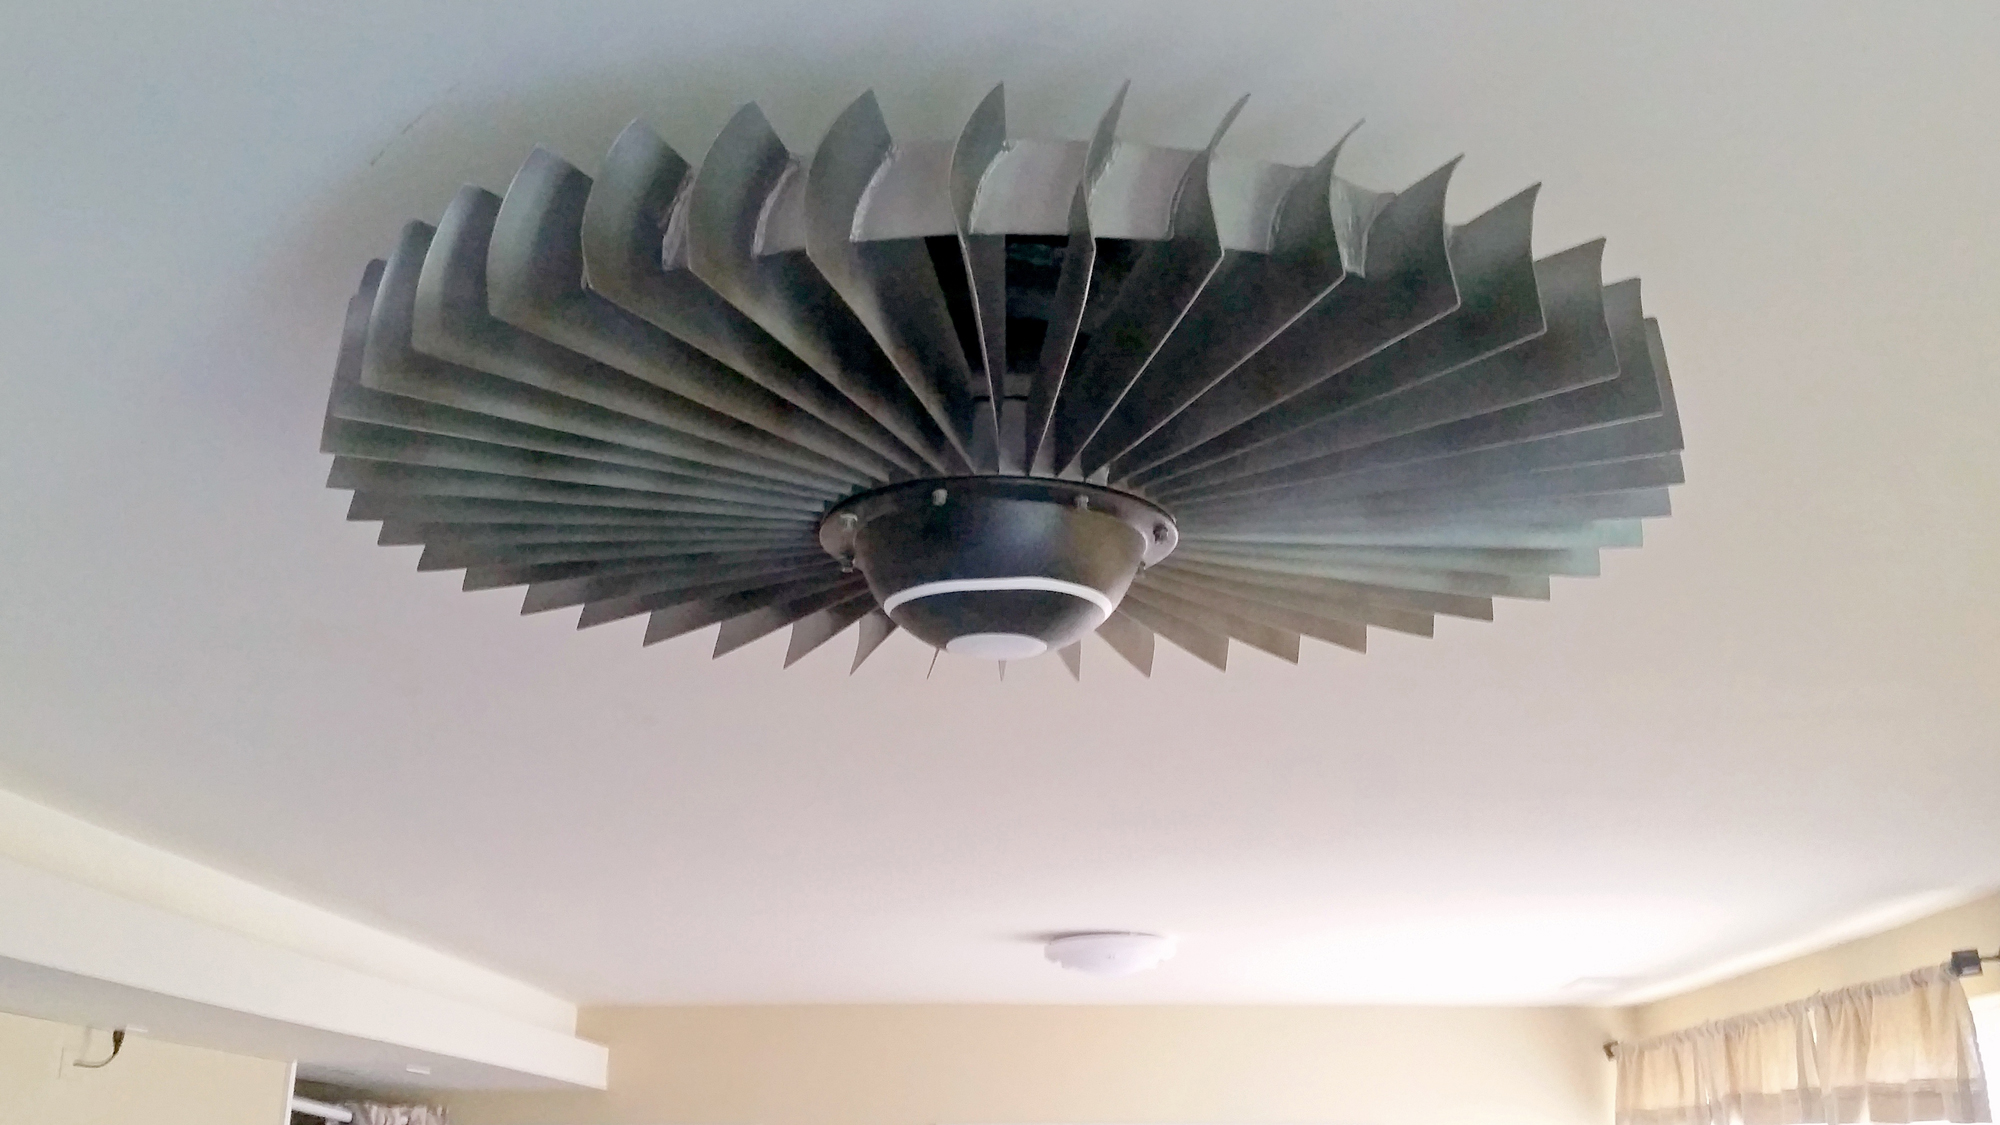 Aeronautical Ceiling Fan : Tech steel materials jet engine ceiling fan is expensive